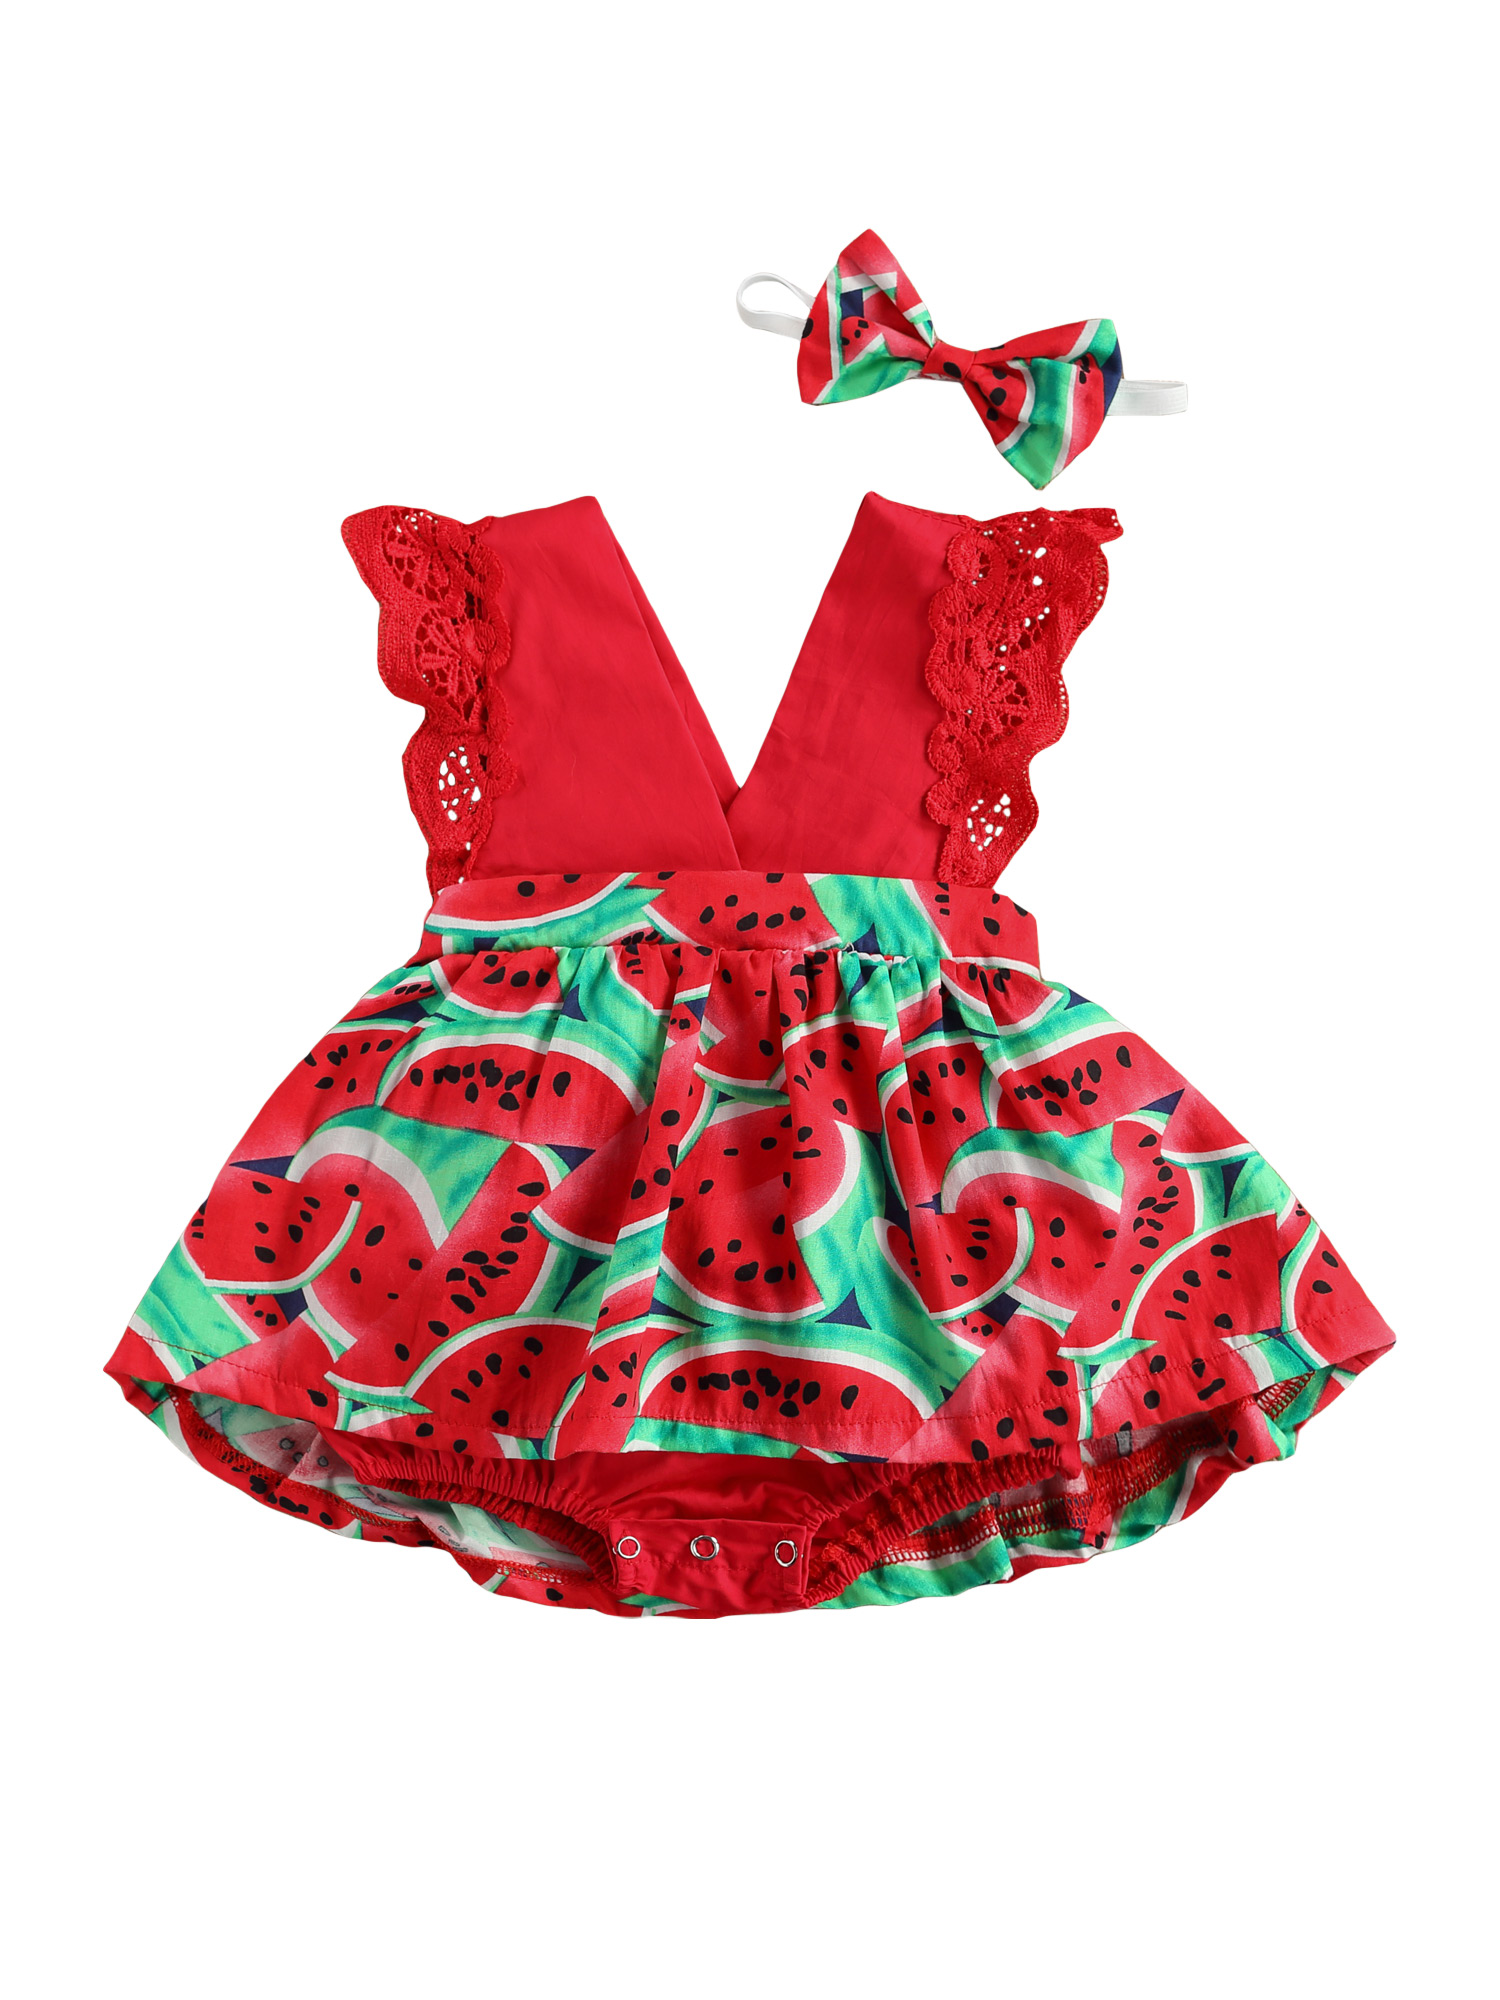 Baby Girl Clothes Watermelon Print Girls Romper Sleeveless Deep V-neck Short Jumpsuit Bow-knot Headband Children's Clothing Set